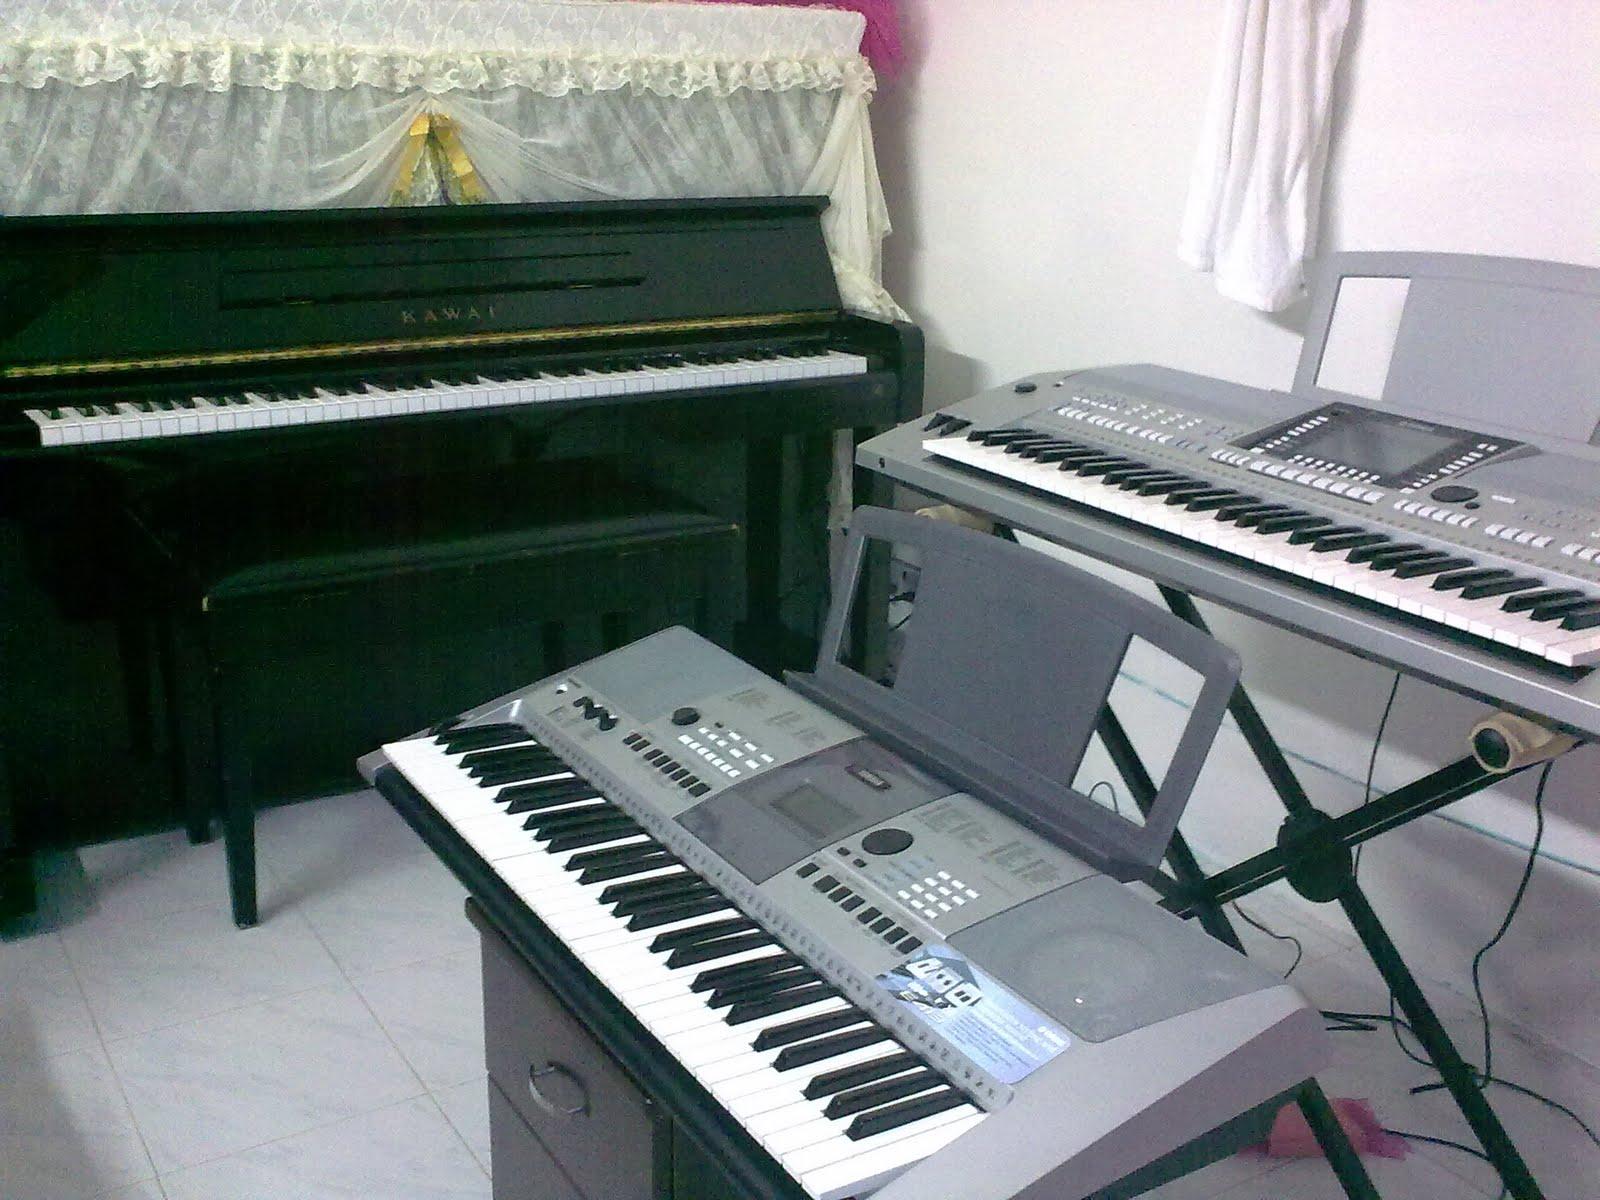 t ng 2 39 s bl0g my new yamaha psr s710 k3yb0 rd. Black Bedroom Furniture Sets. Home Design Ideas